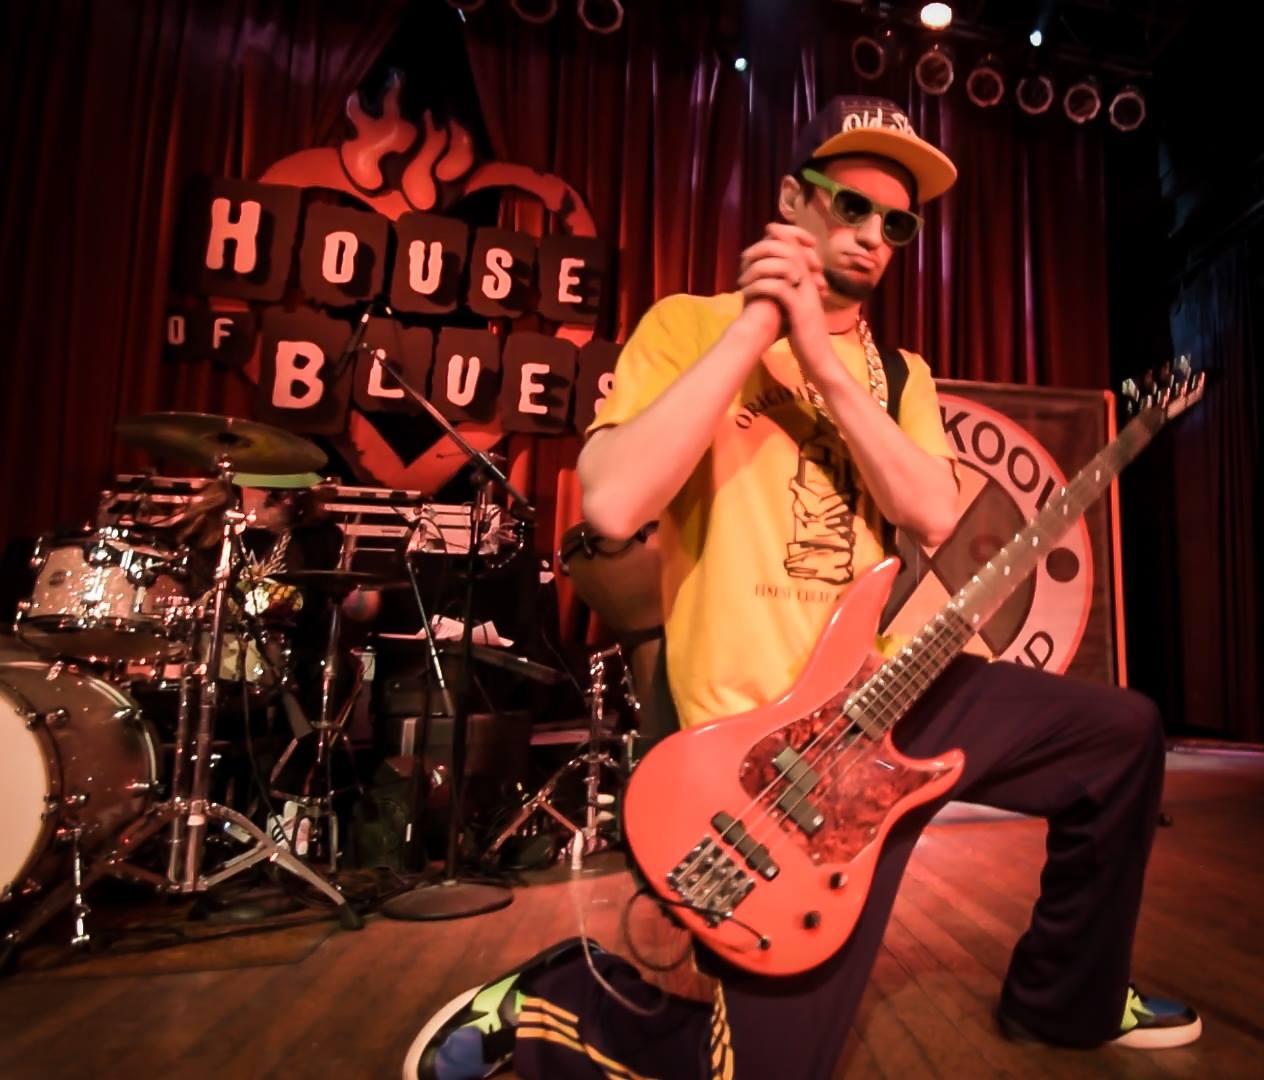 Steve - House of Blues